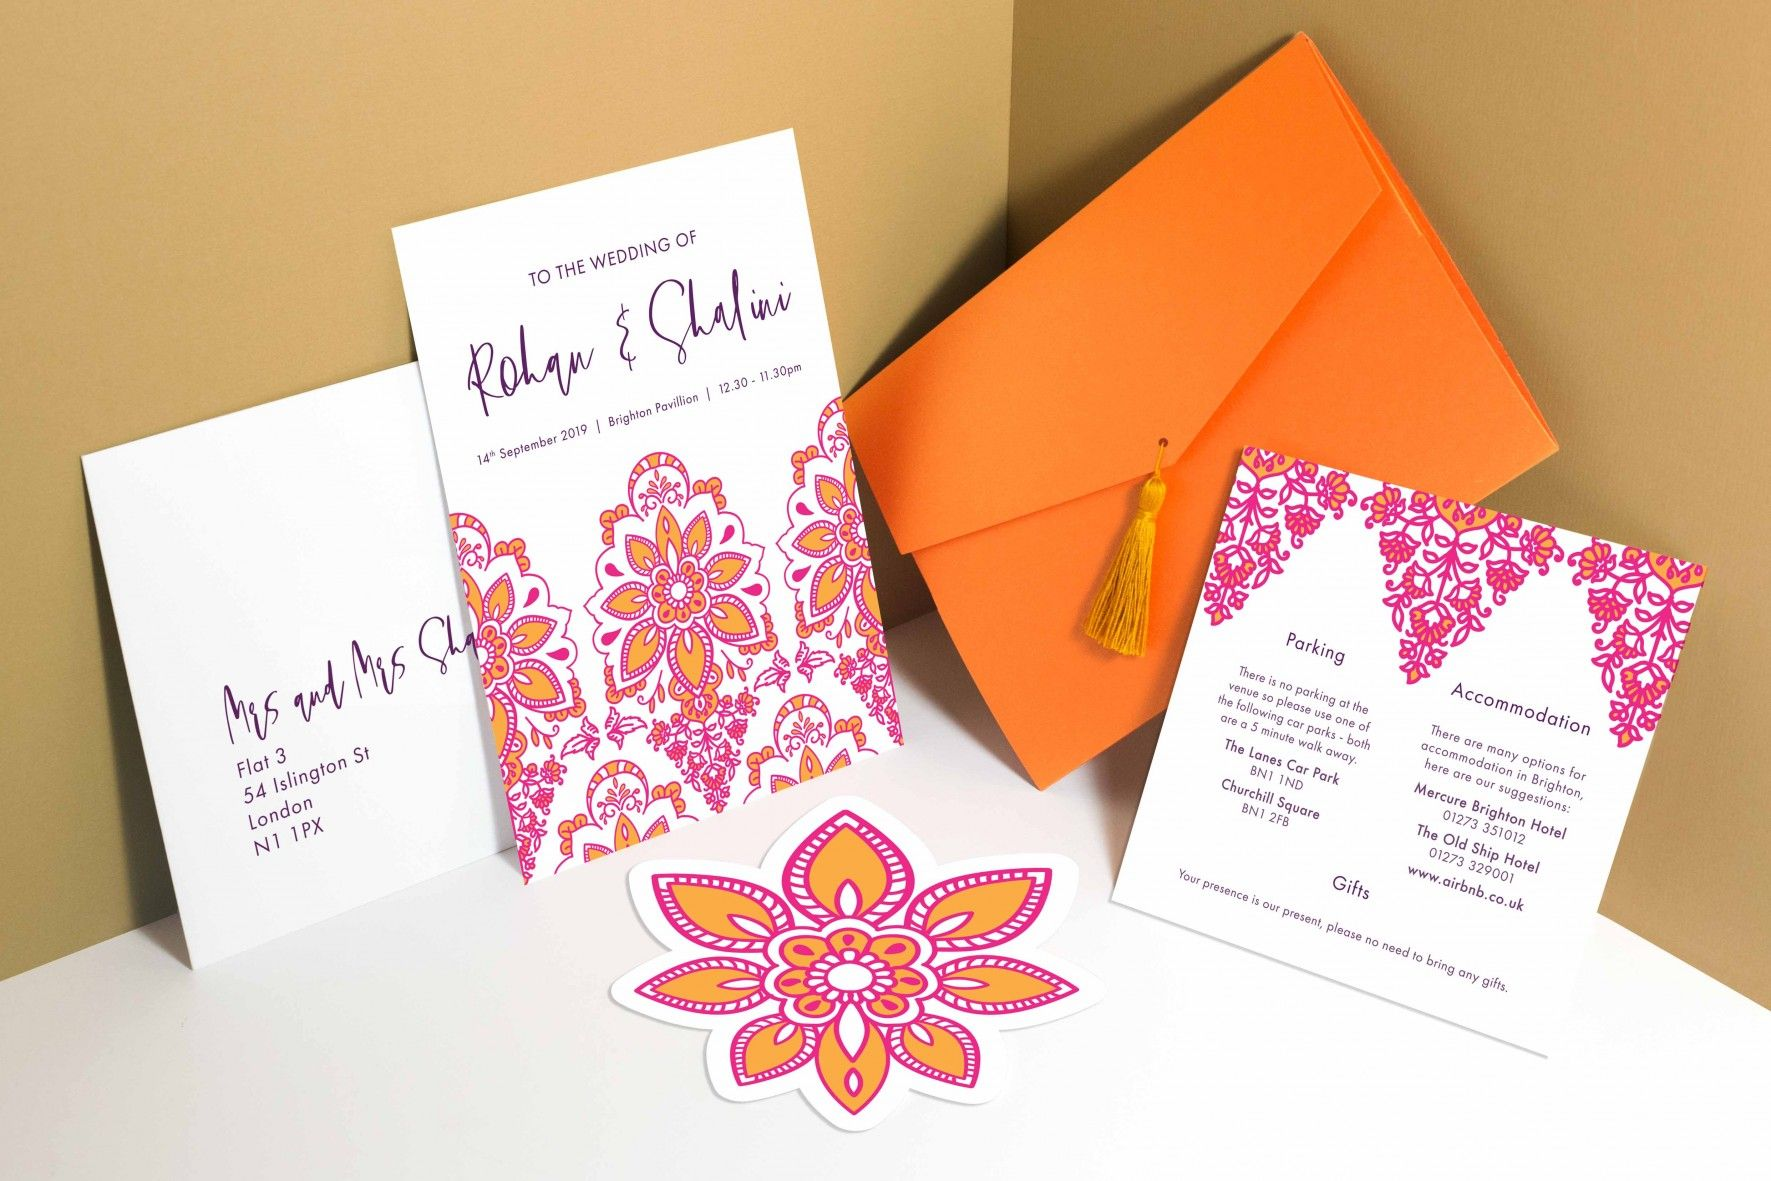 Modern Indian Inspired Pink And Orange Wedding Invitation And Stationery Orange Wedding Invitations Wedding Stationery Design Modern Indian Wedding Invitations